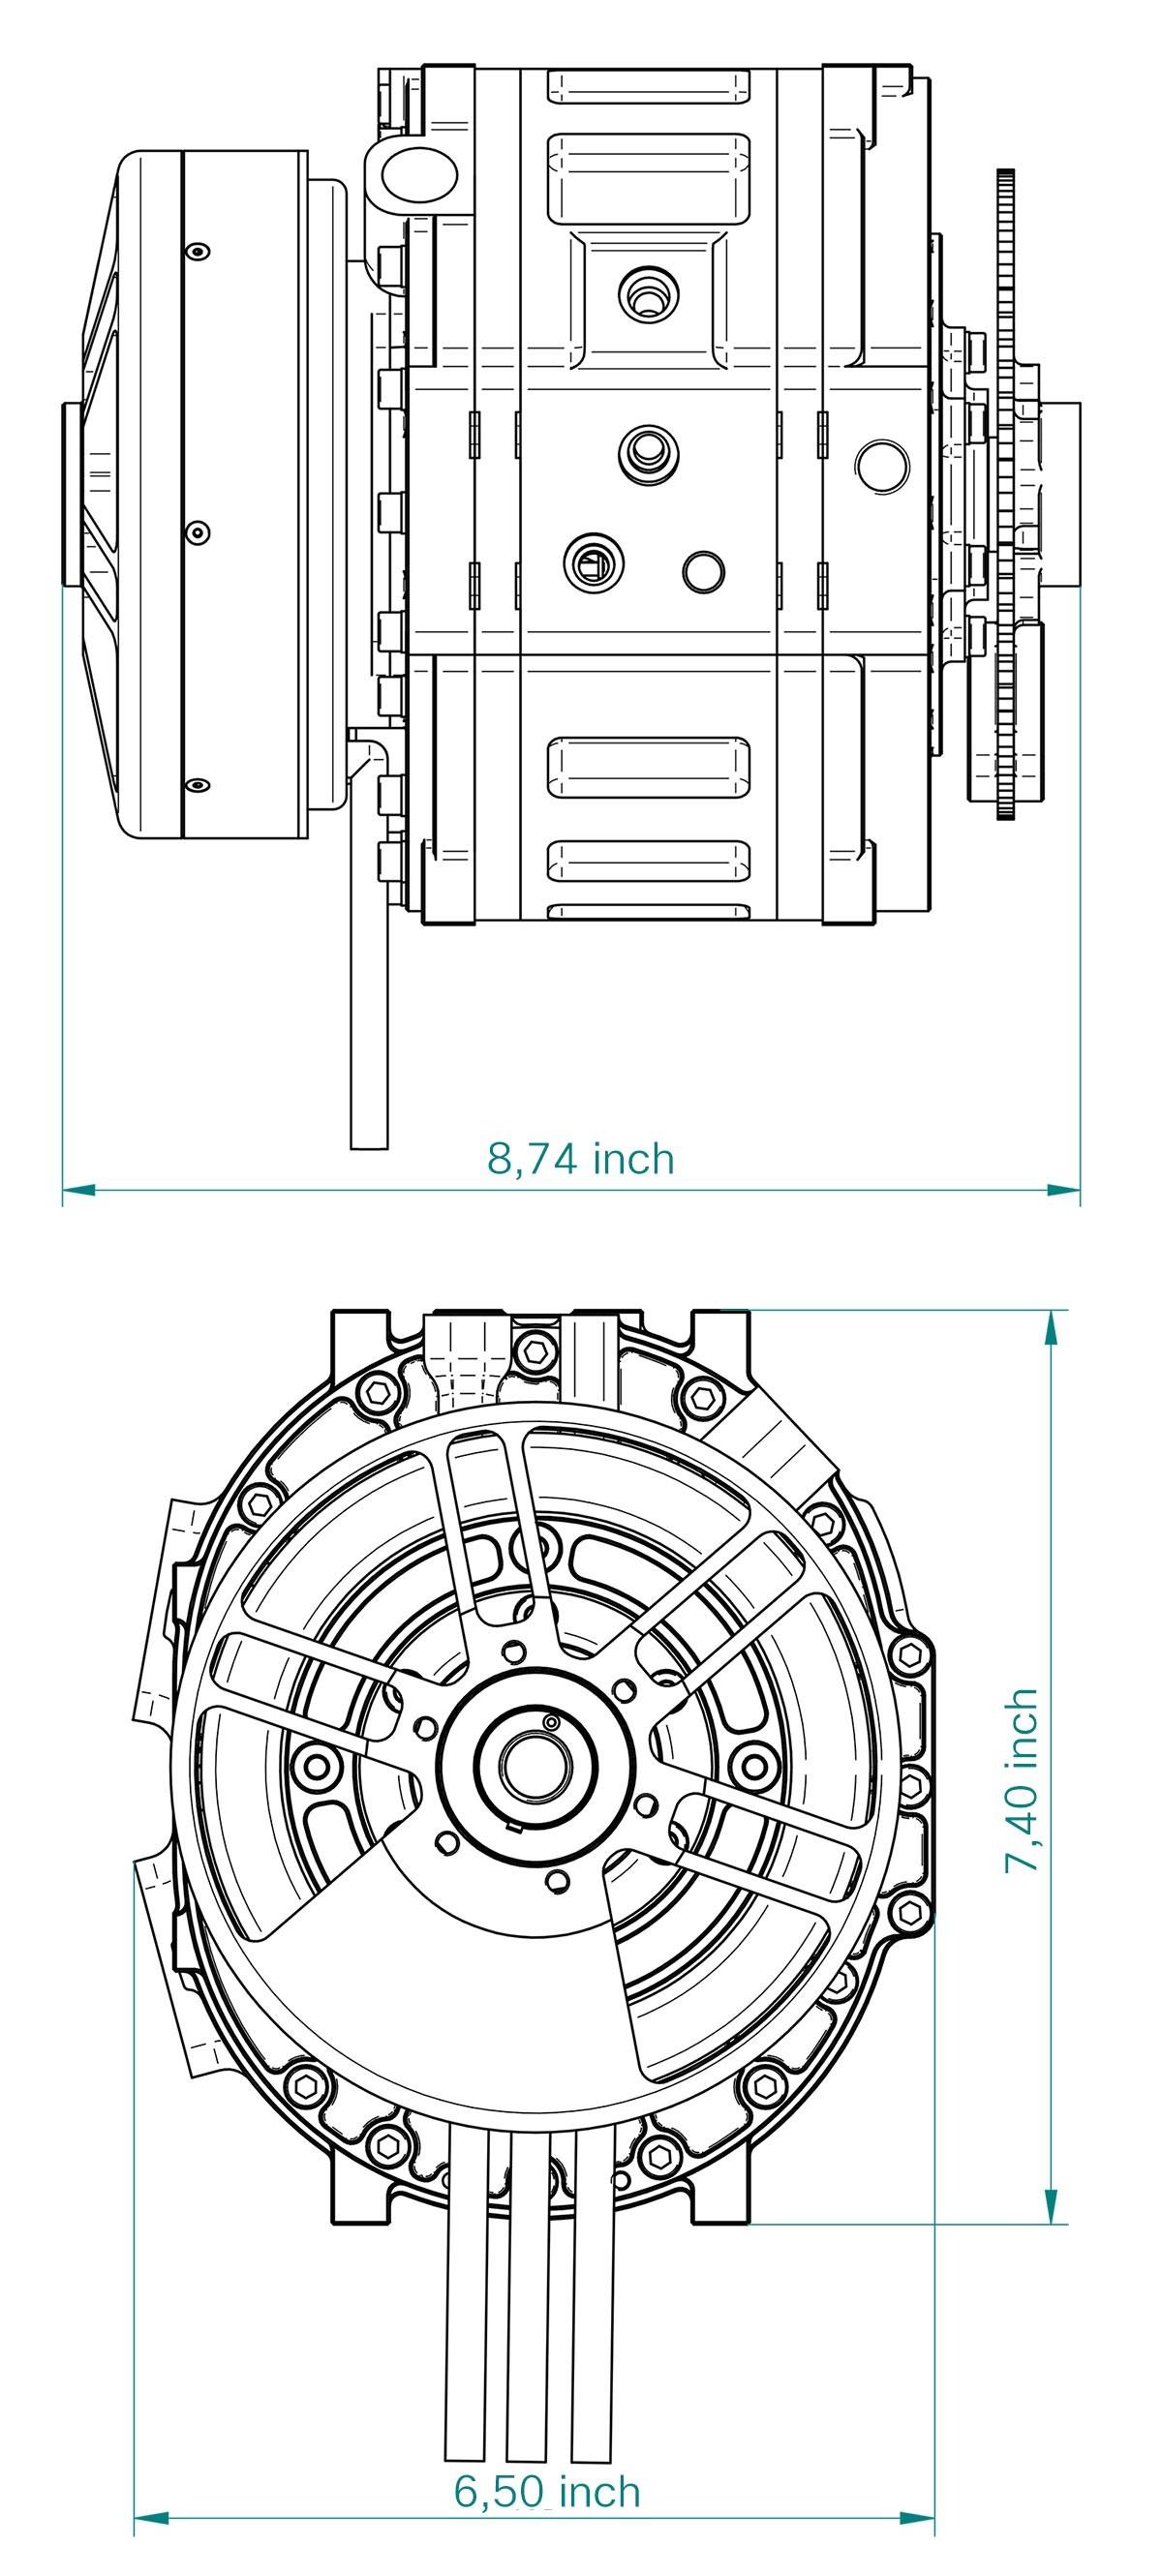 Wankel Rotary Engine Diagram